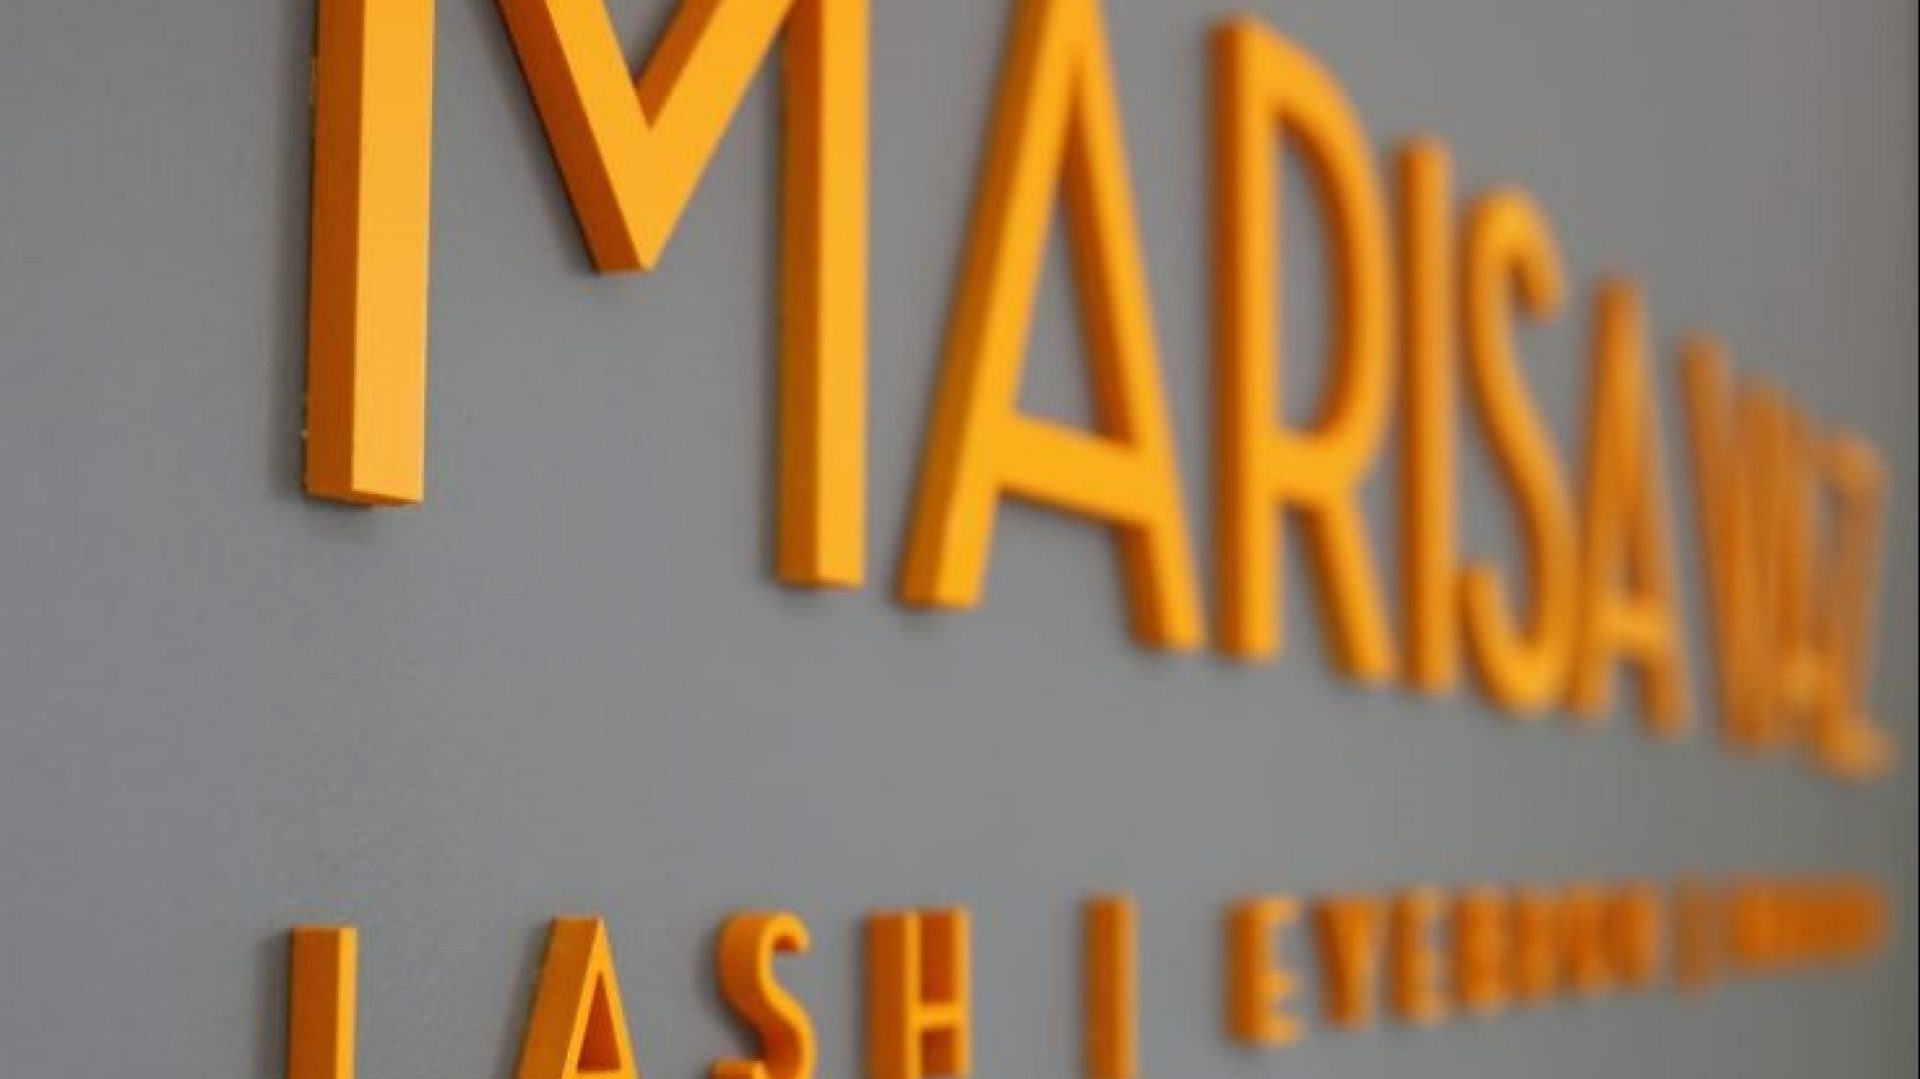 MarisaVaz